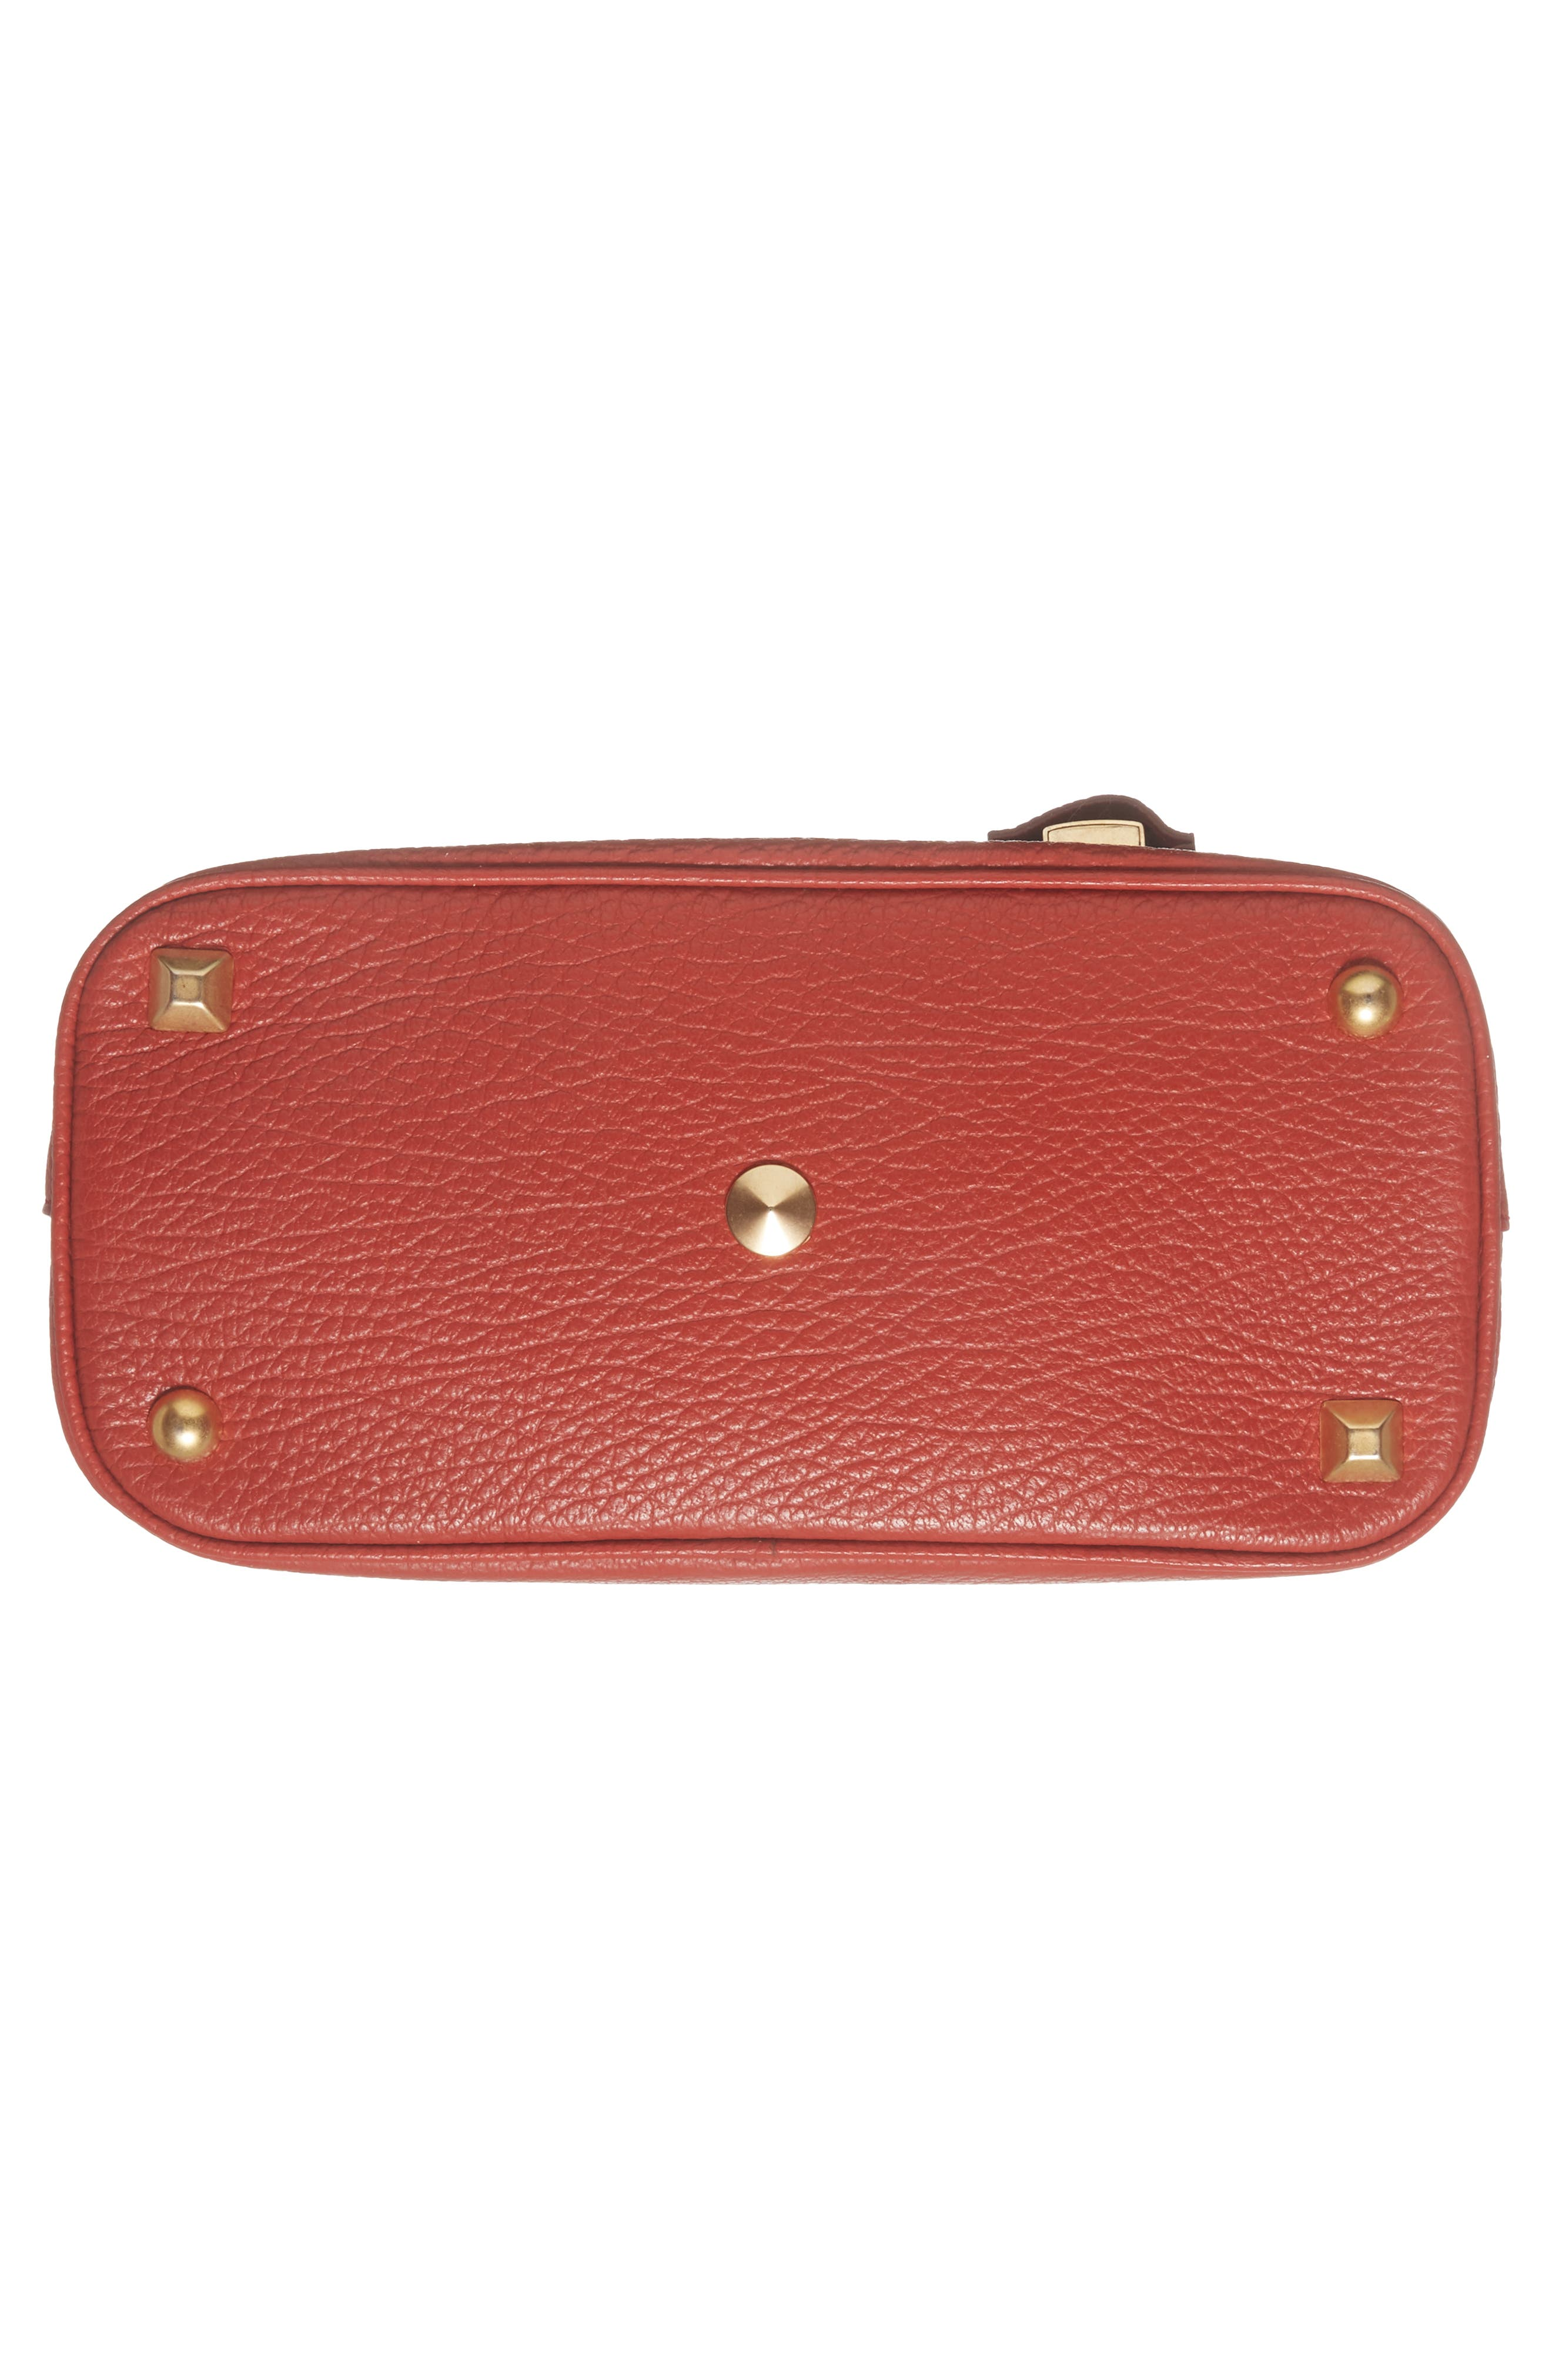 Small 5AC Calfskin Leather Handbag,                             Alternate thumbnail 7, color,                             600